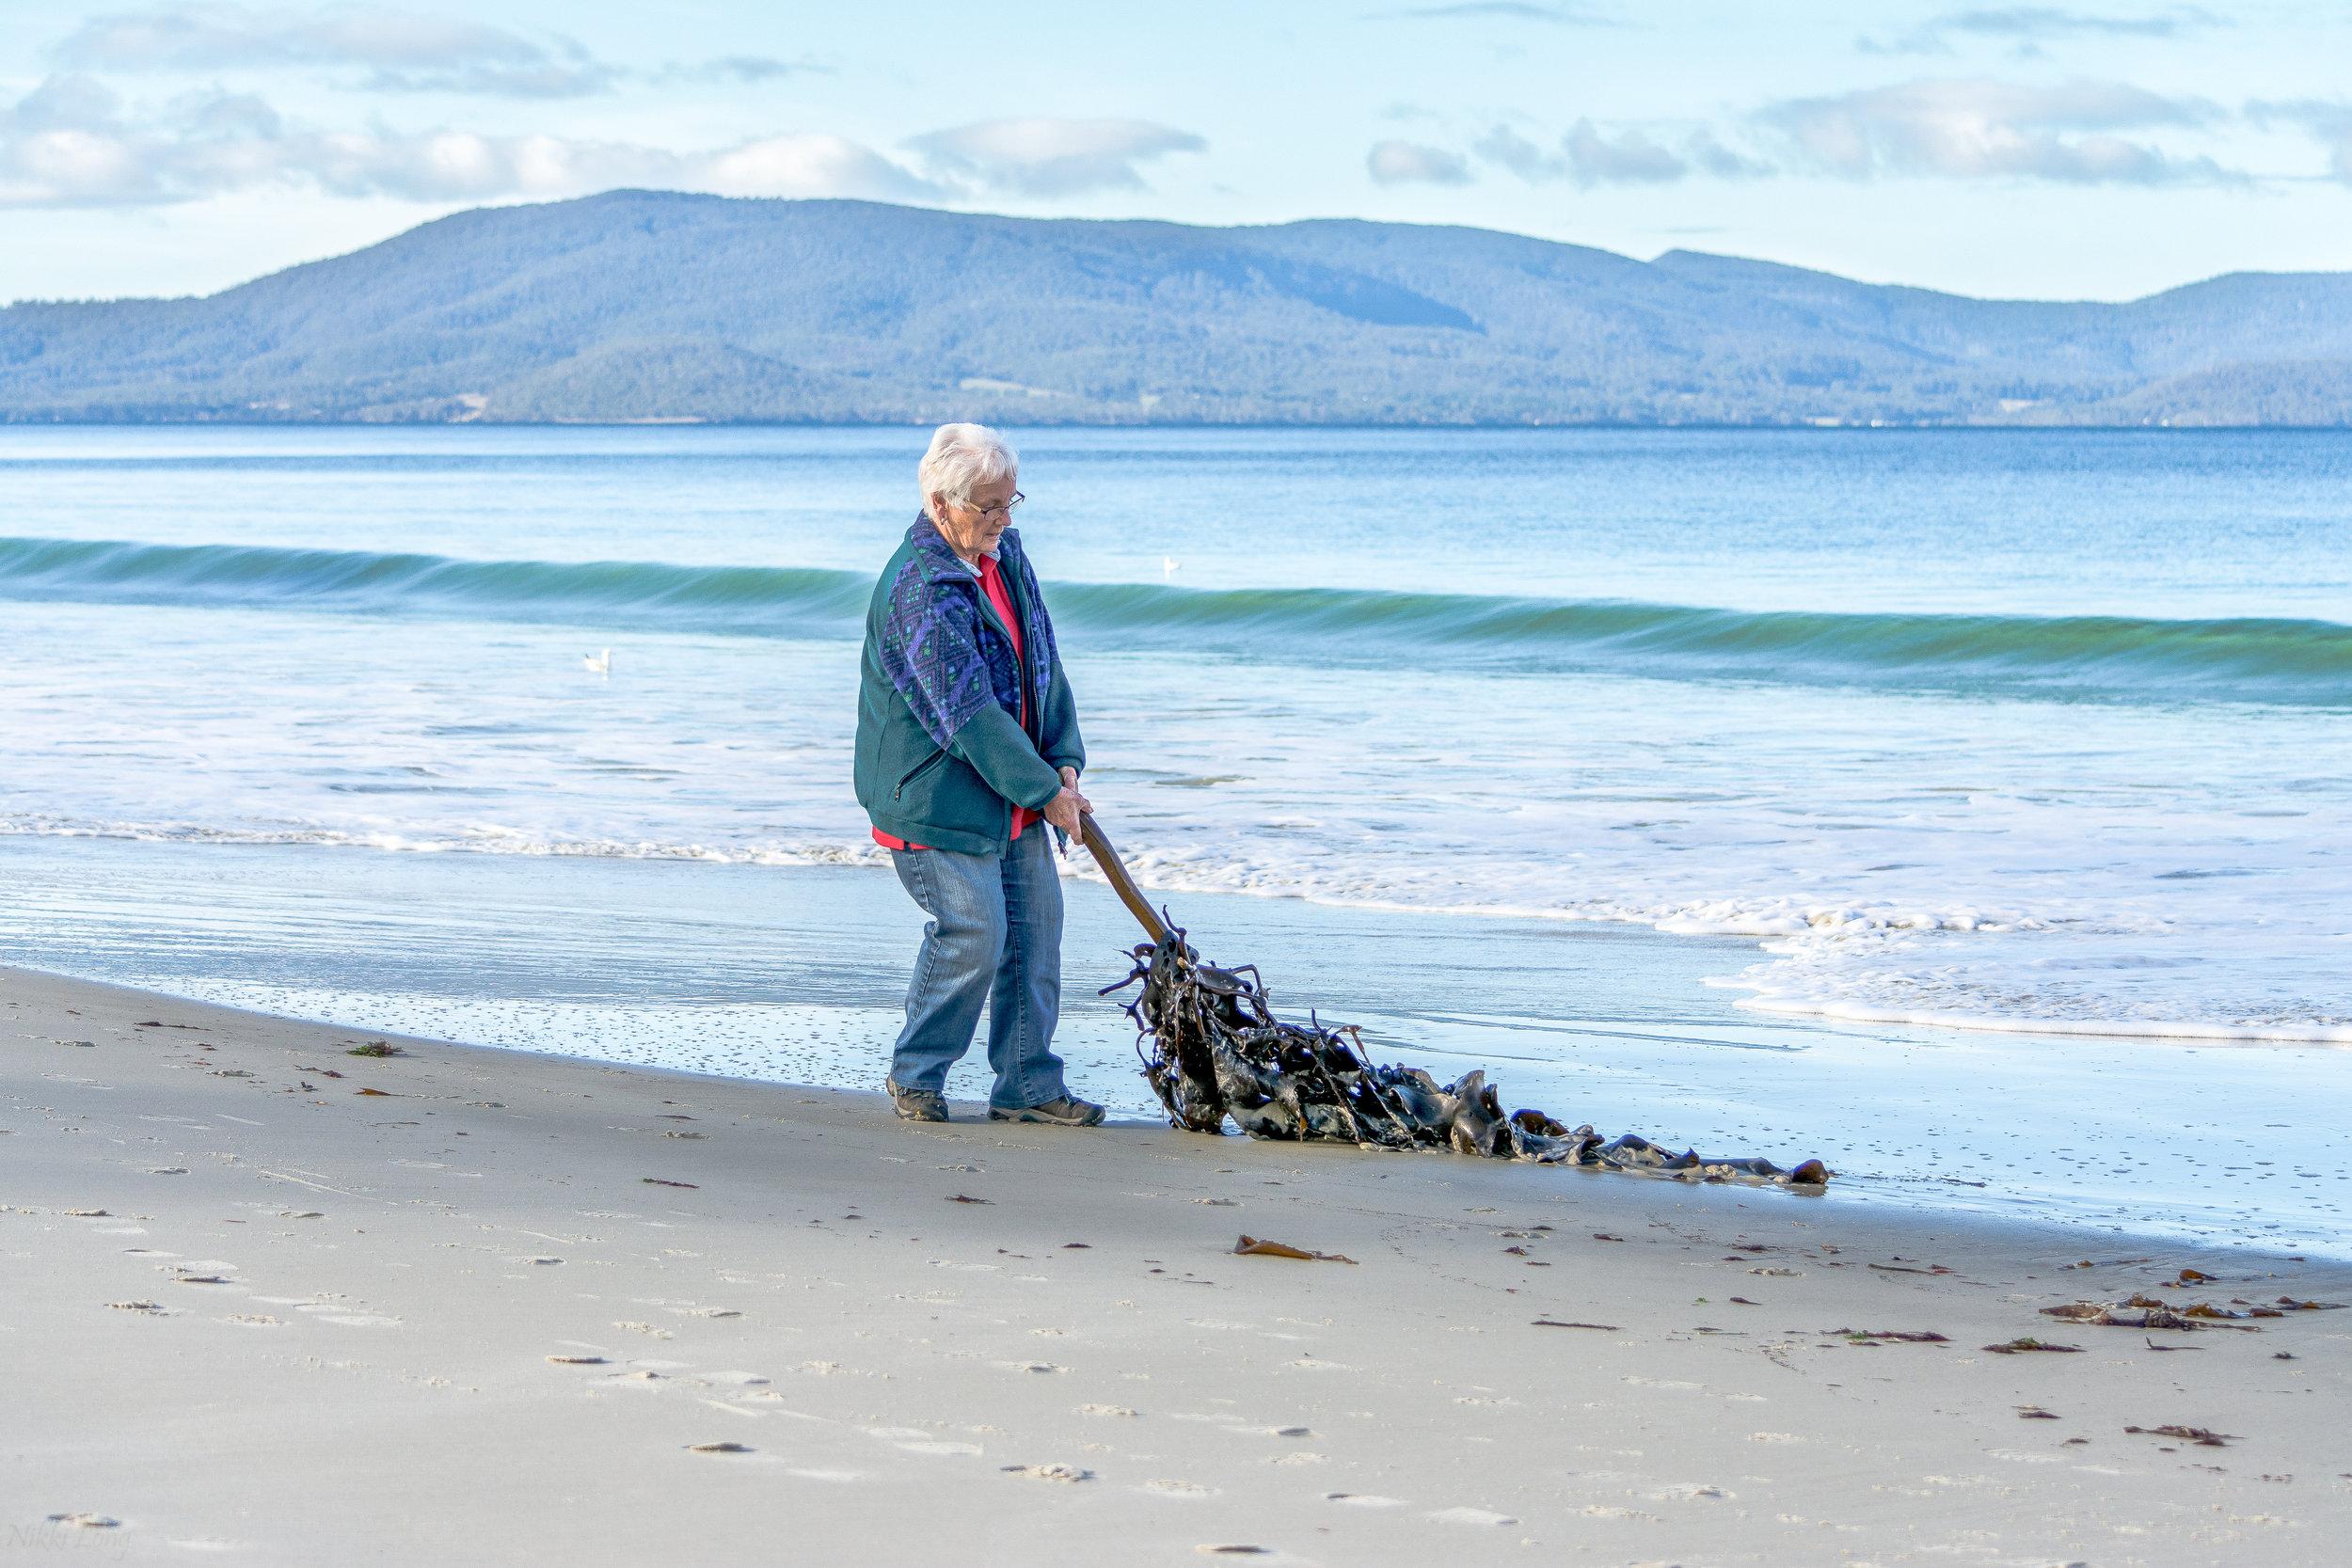 Helen Edwards collecting kelp - photo by Nikki Long 1.jpg